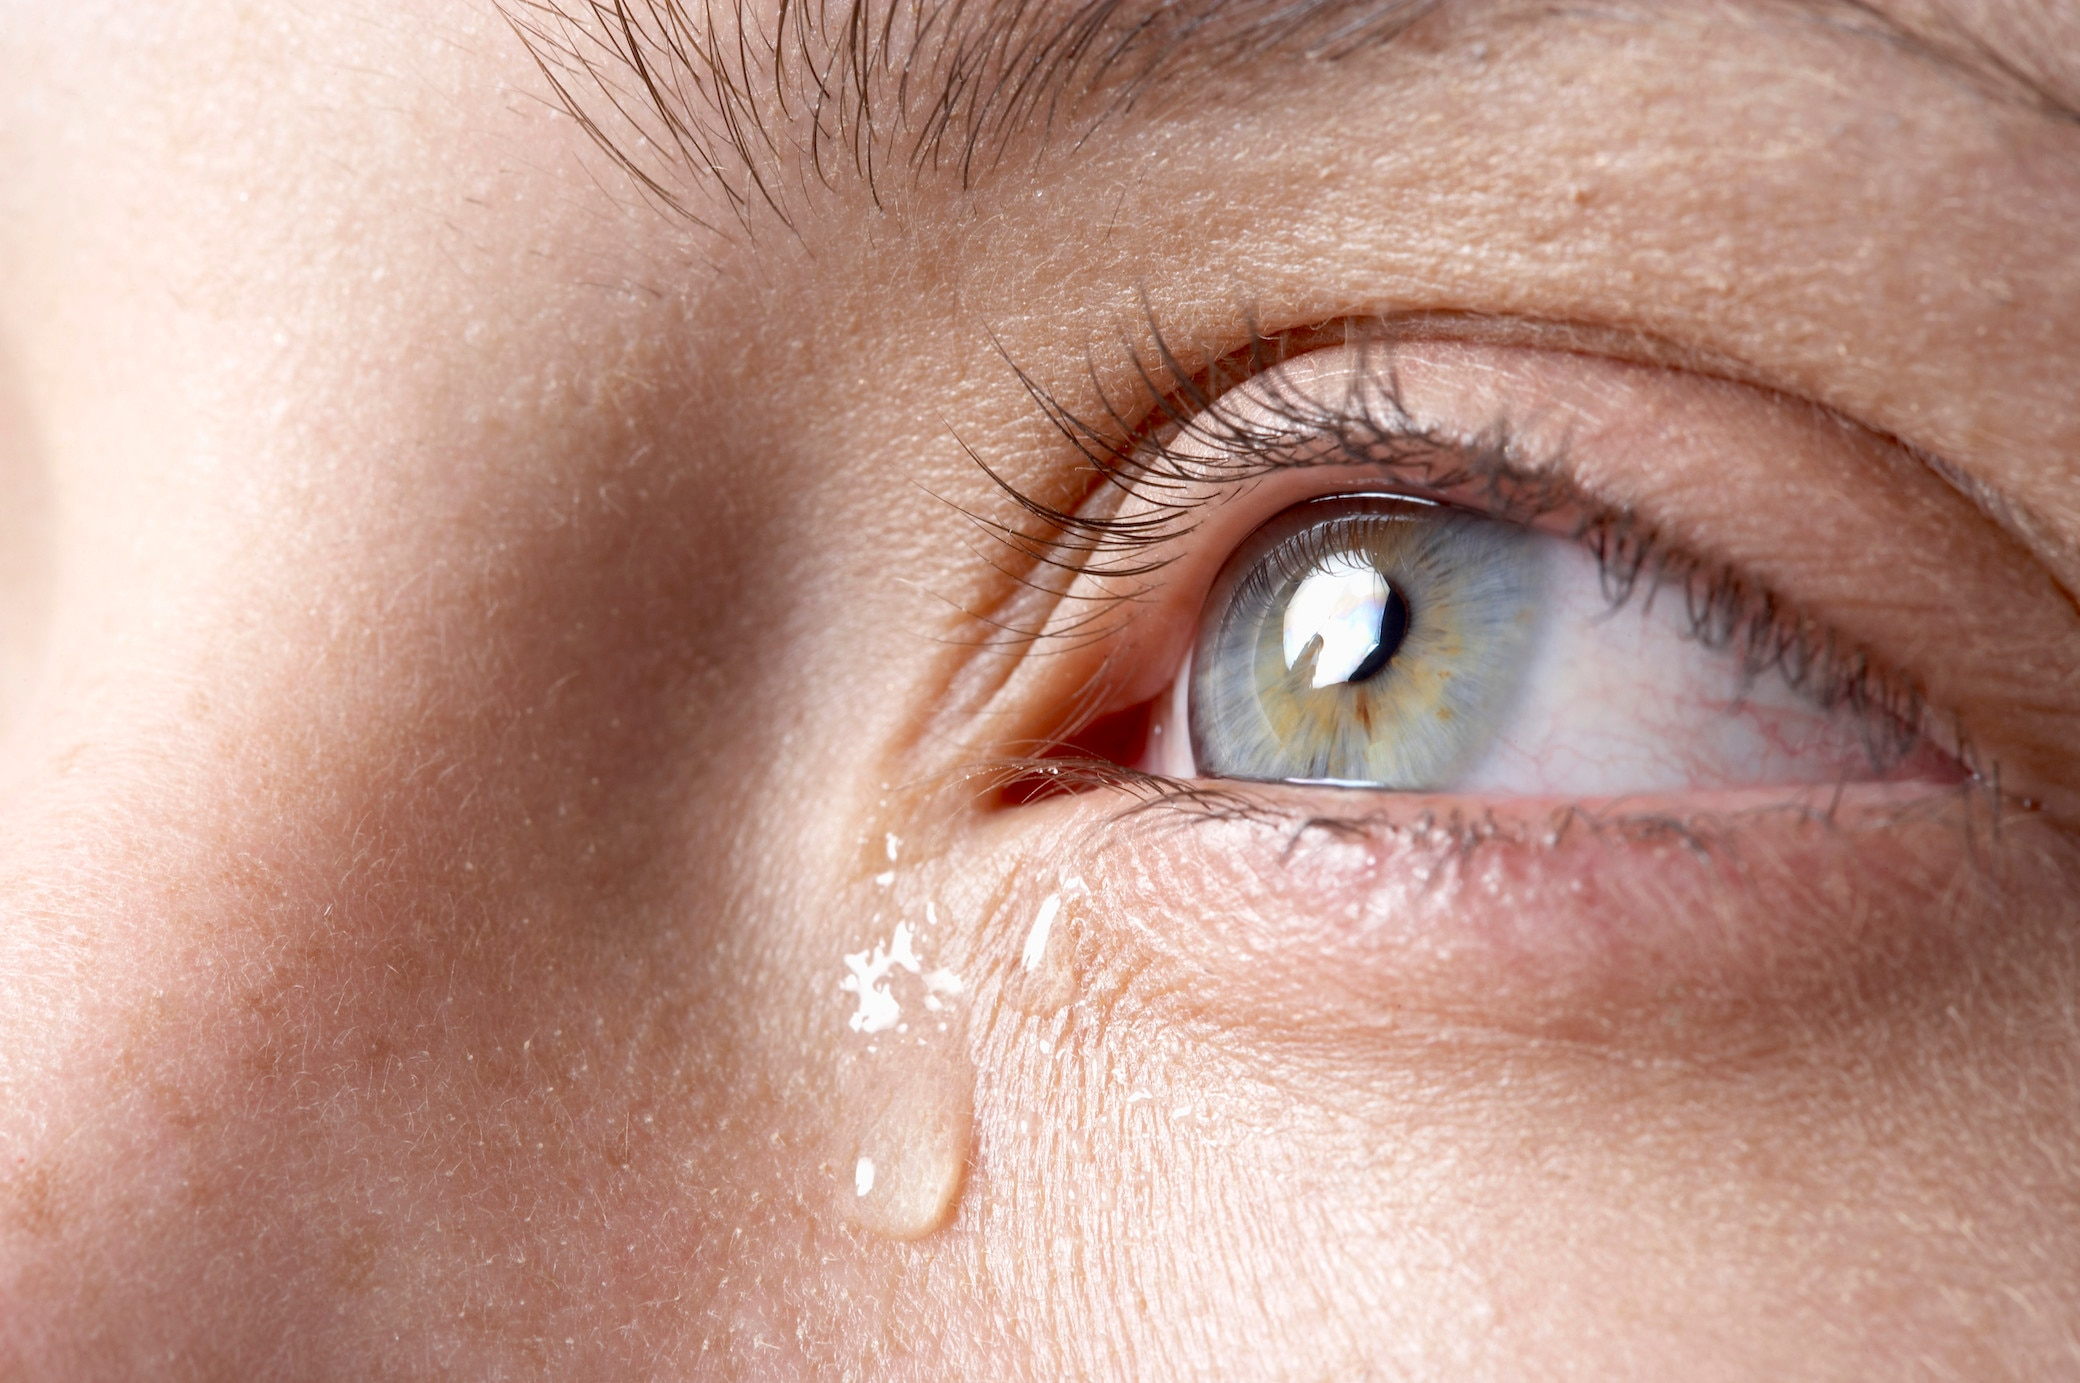 Bald könnte man Nervenerkrankungen an den Tränen erkennen